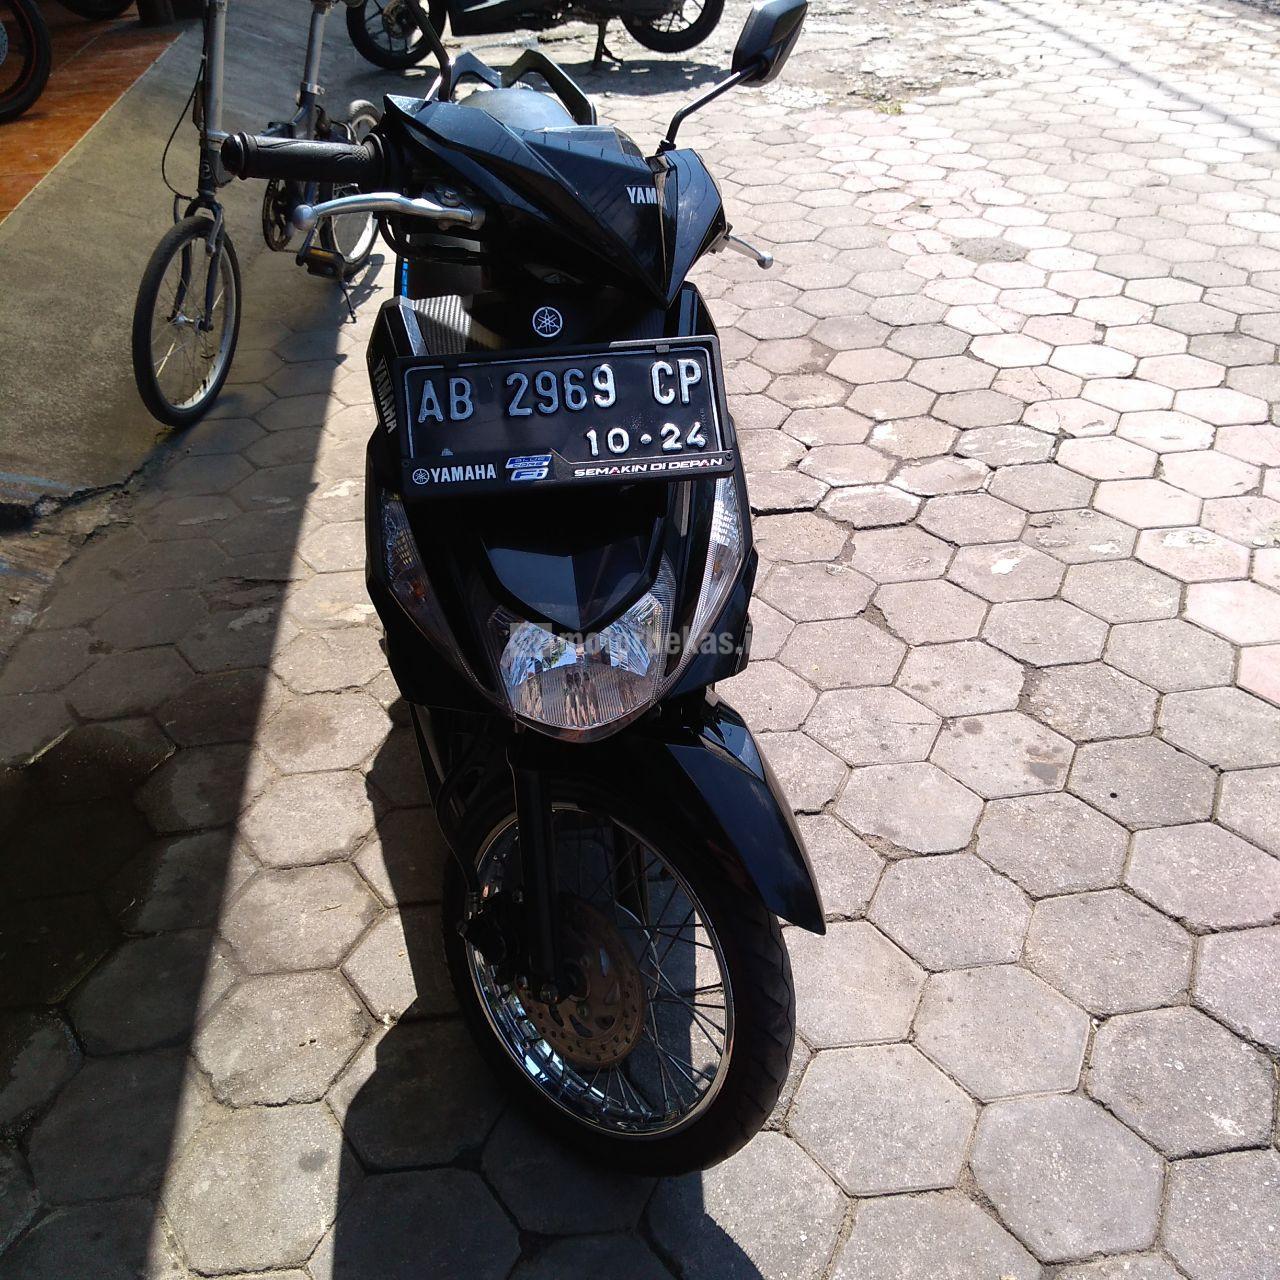 YAMAHA MIO M3 125  339 motorbekas.id